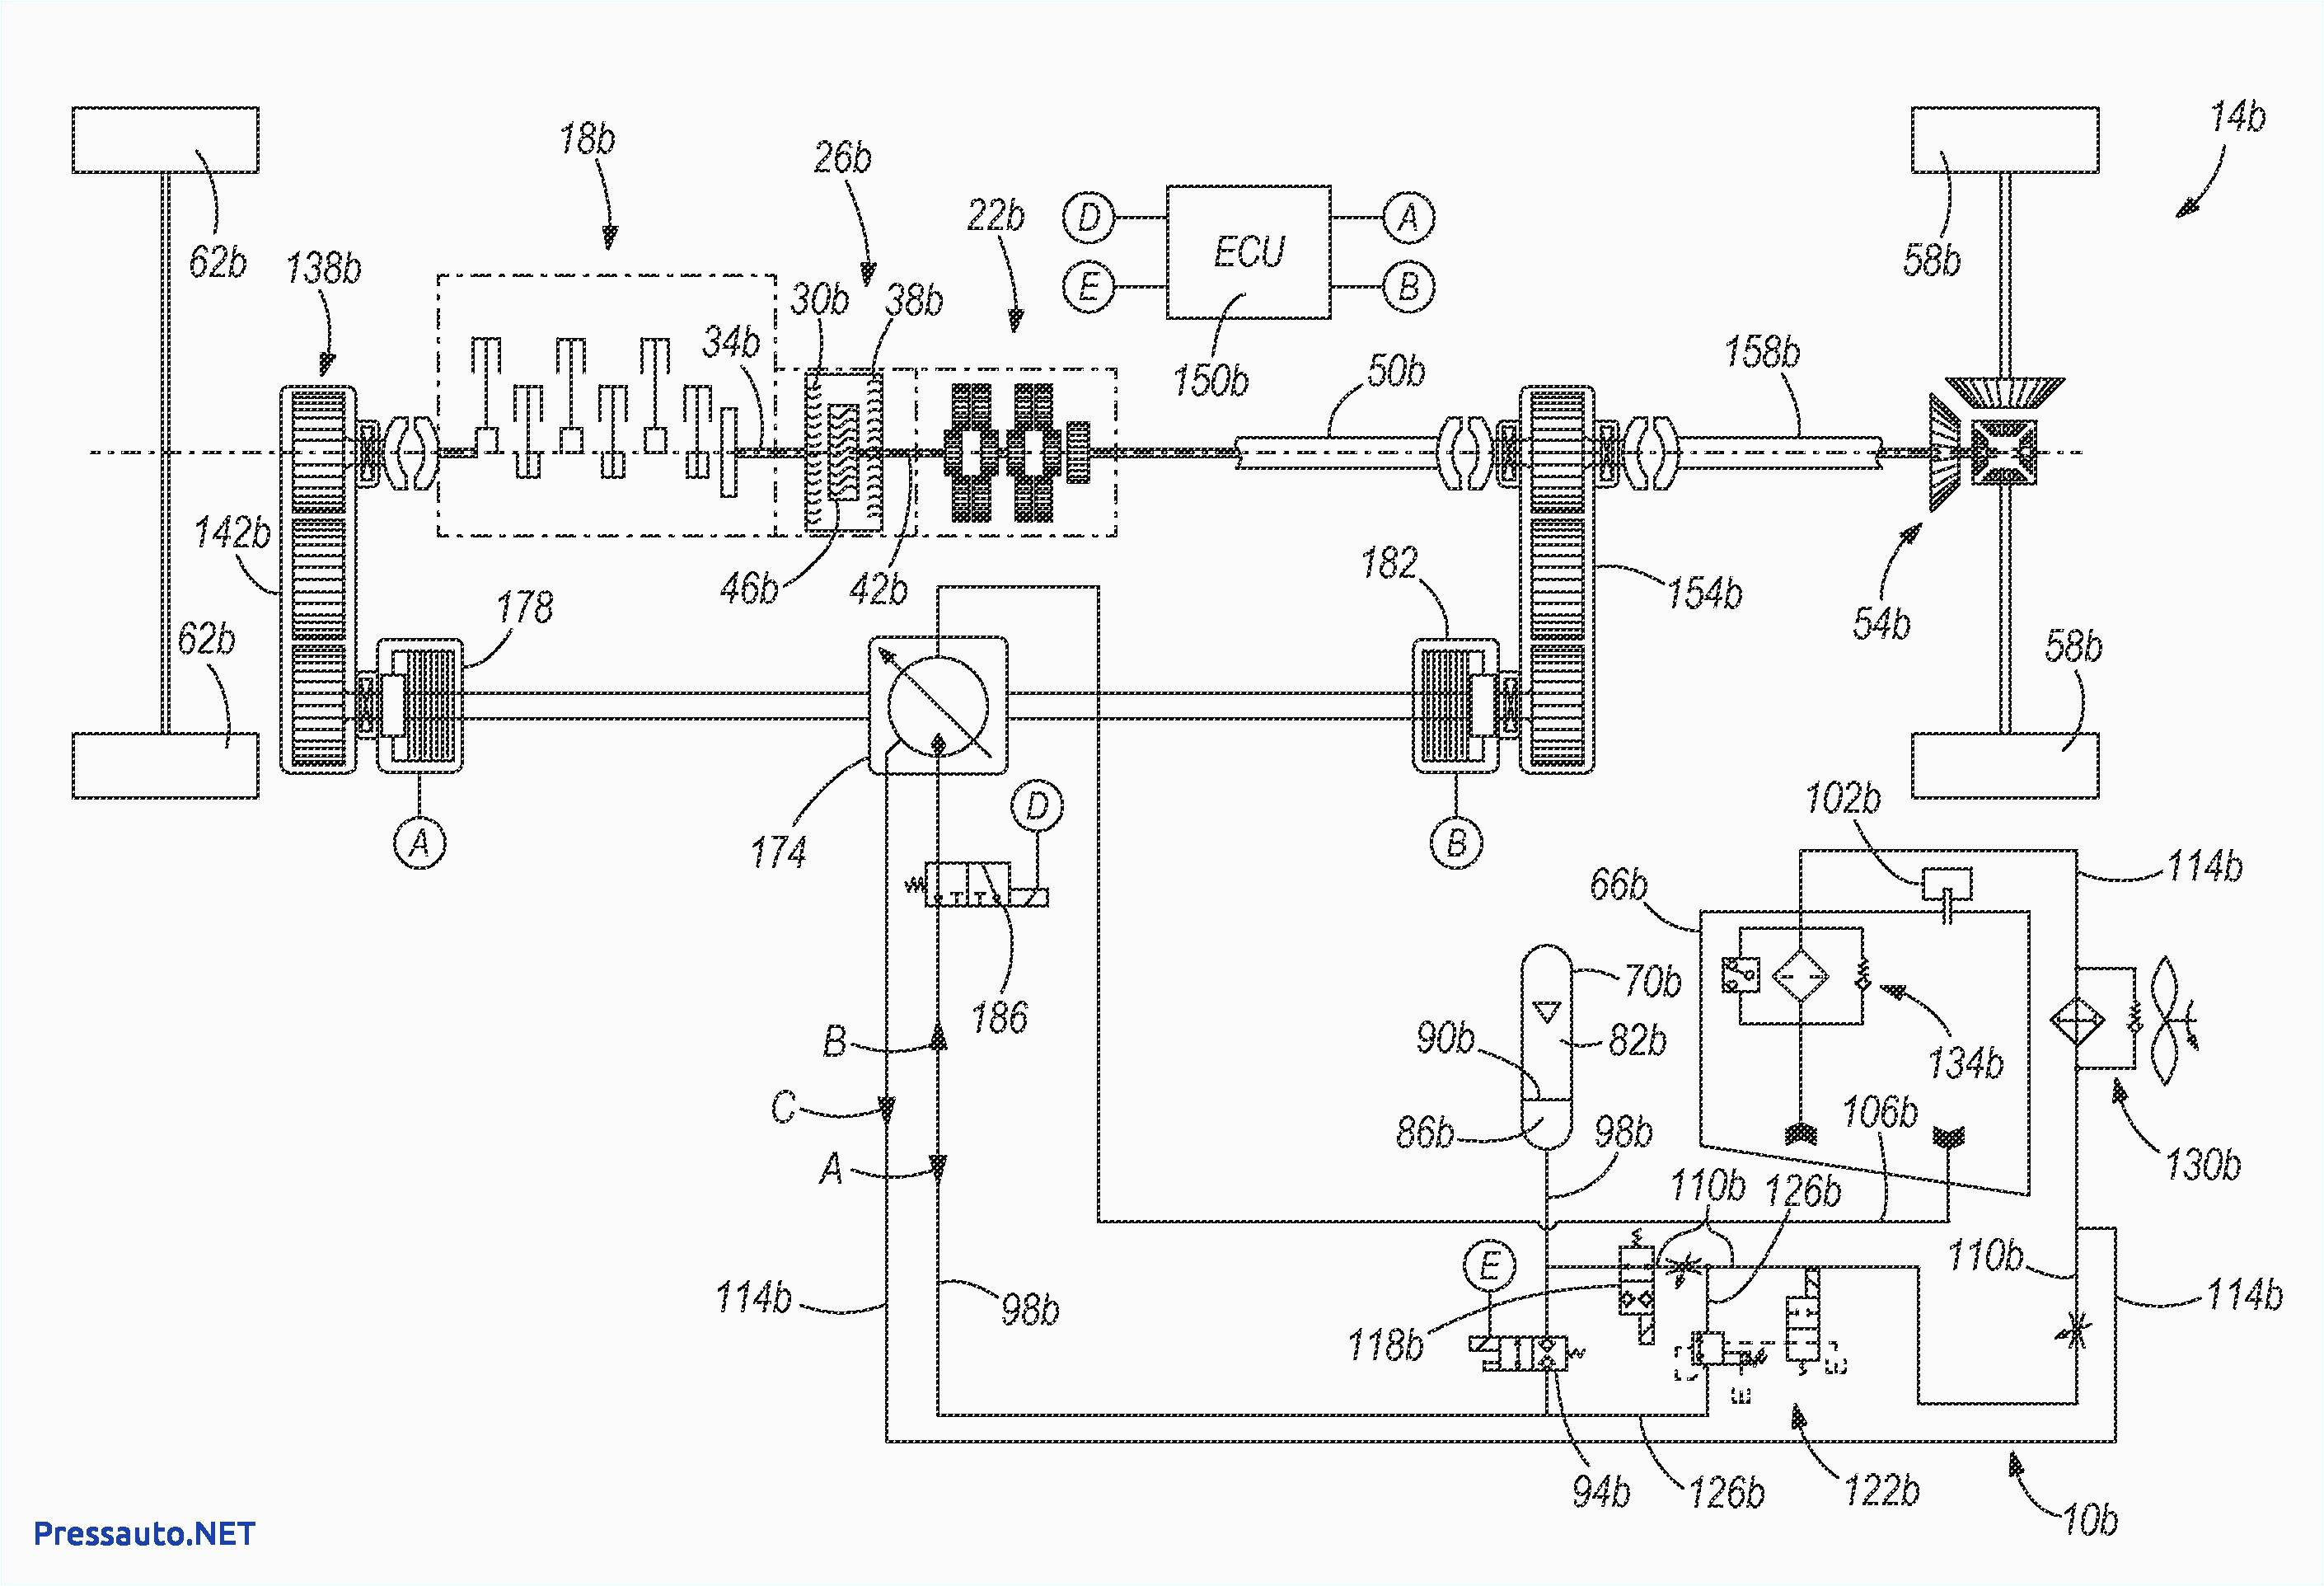 wiring diagrams 2001 fleetwood storm wiring diagram home fleetwood storm rv wiring diagrams